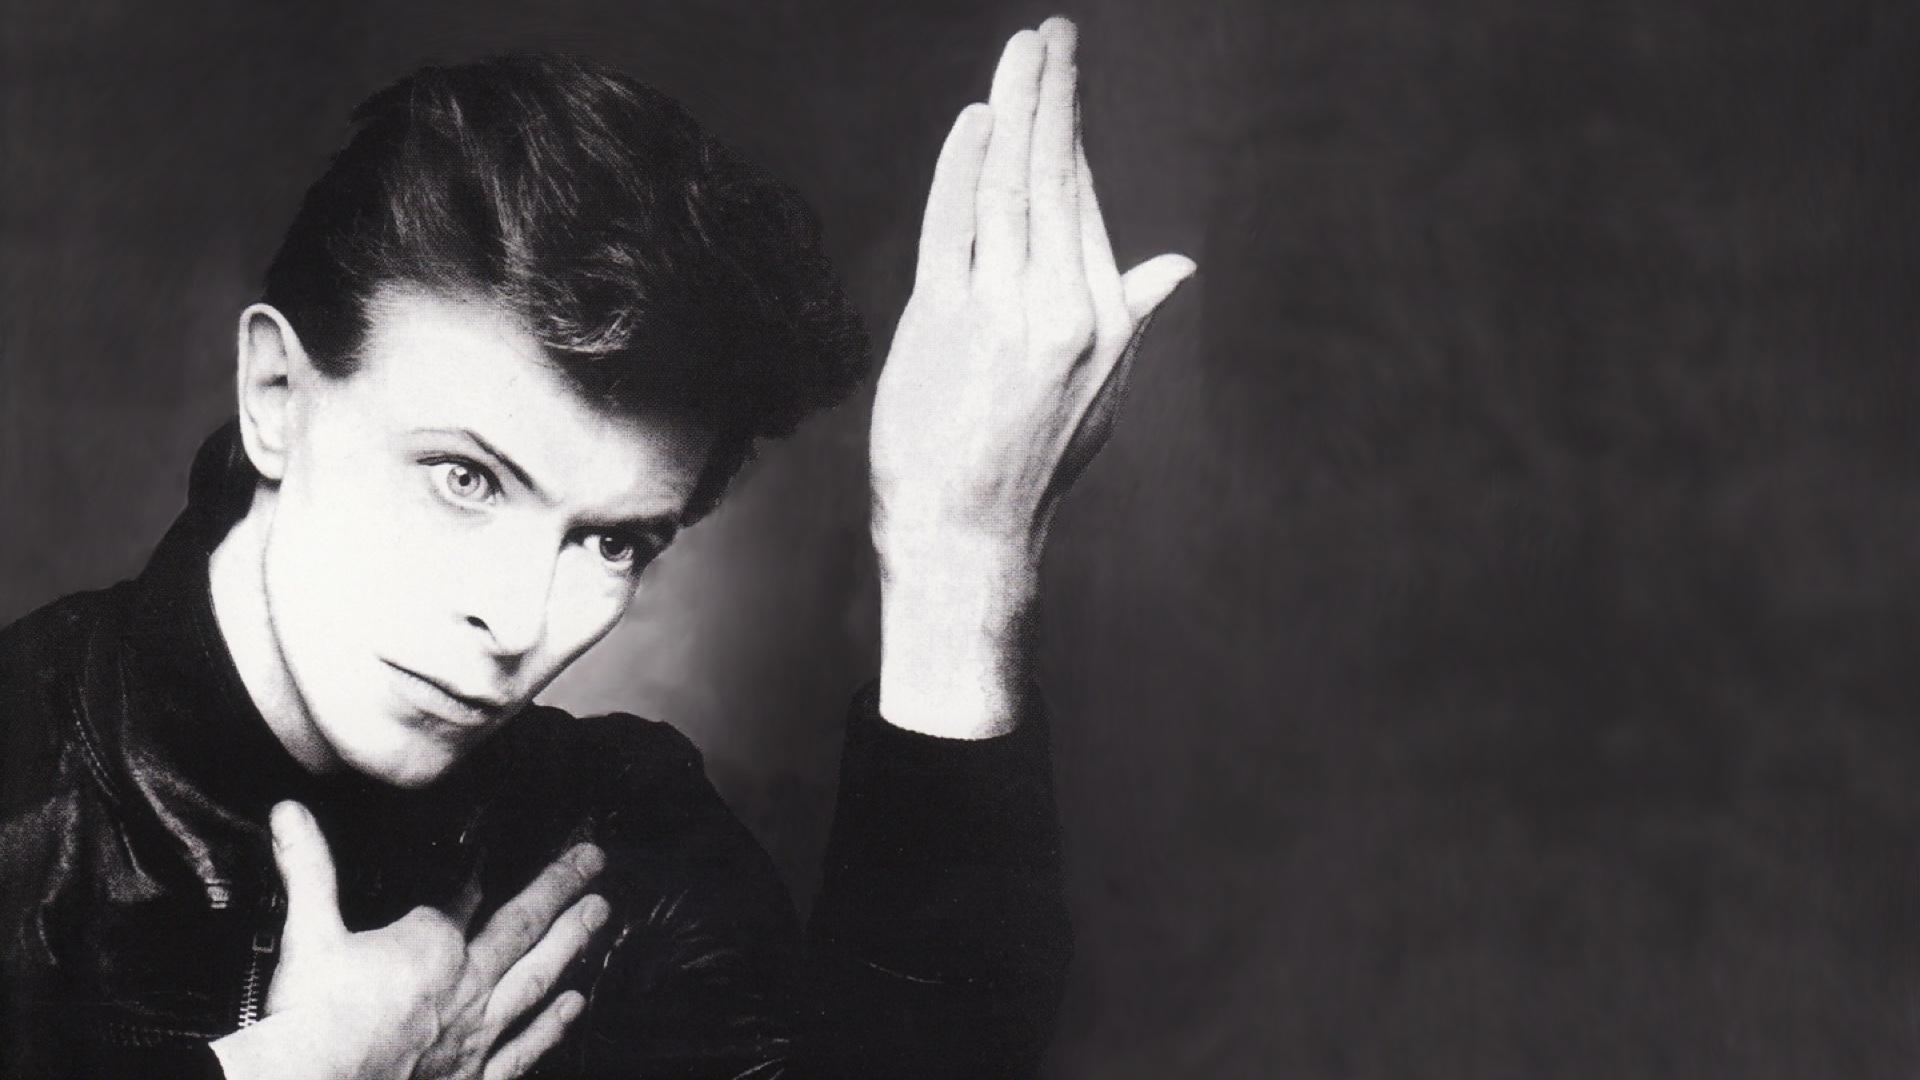 Heroes, un capolavoro firmato Bowie